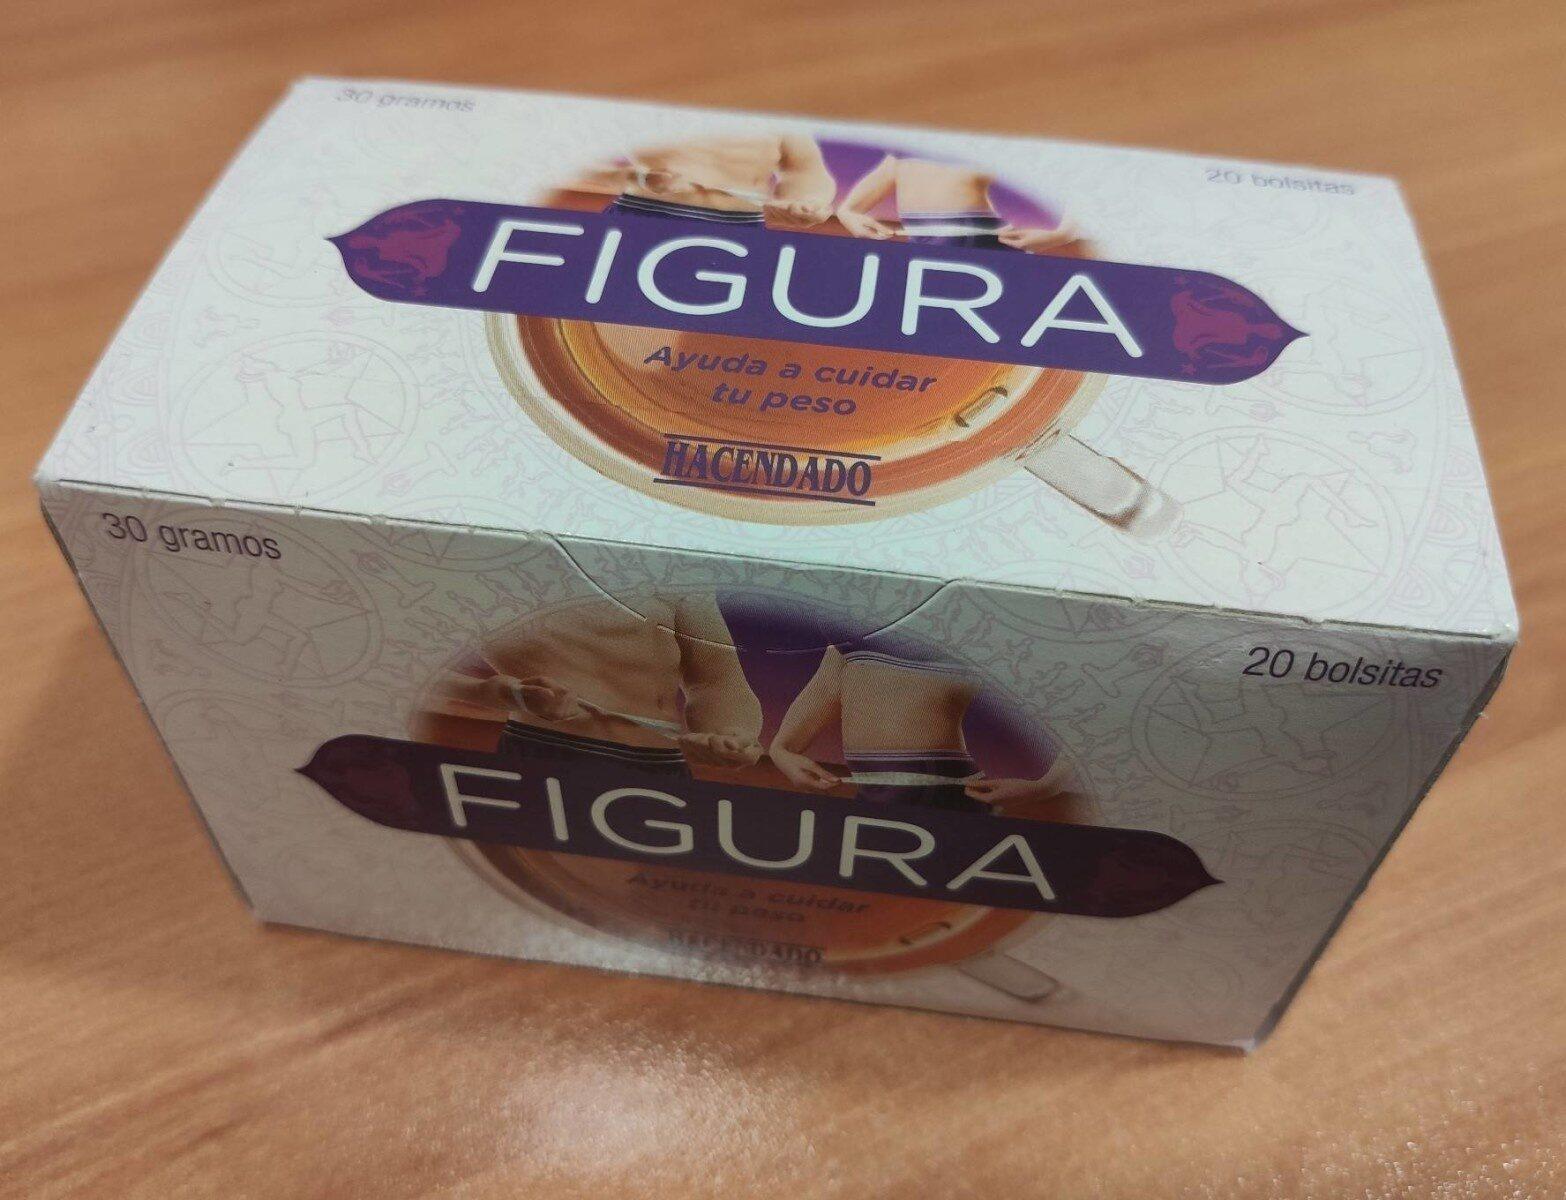 Infusion figura - Producto - es